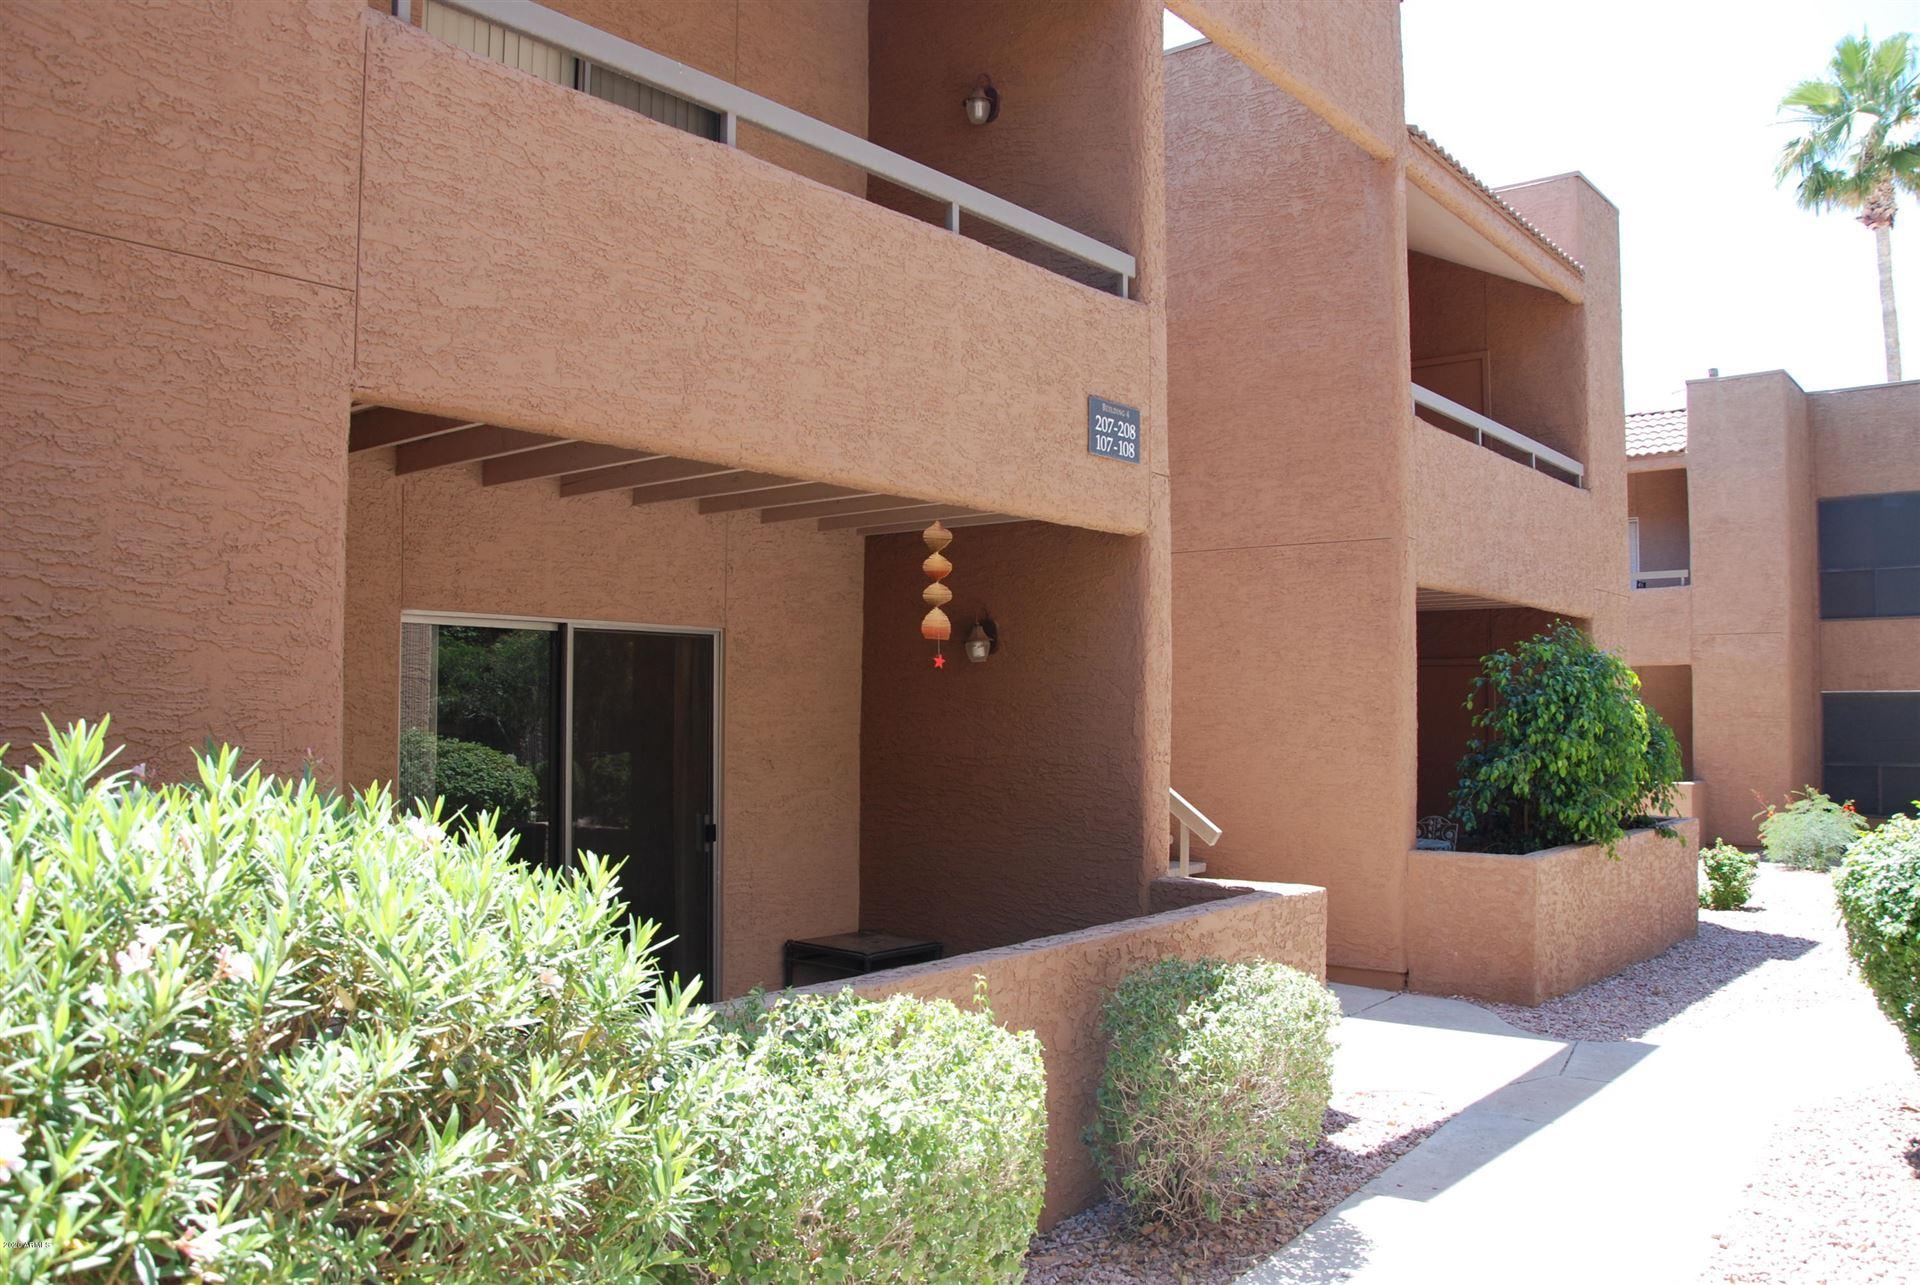 Photo of 2625 E INDIAN SCHOOL Road #237, Phoenix, AZ 85016 (MLS # 6250132)